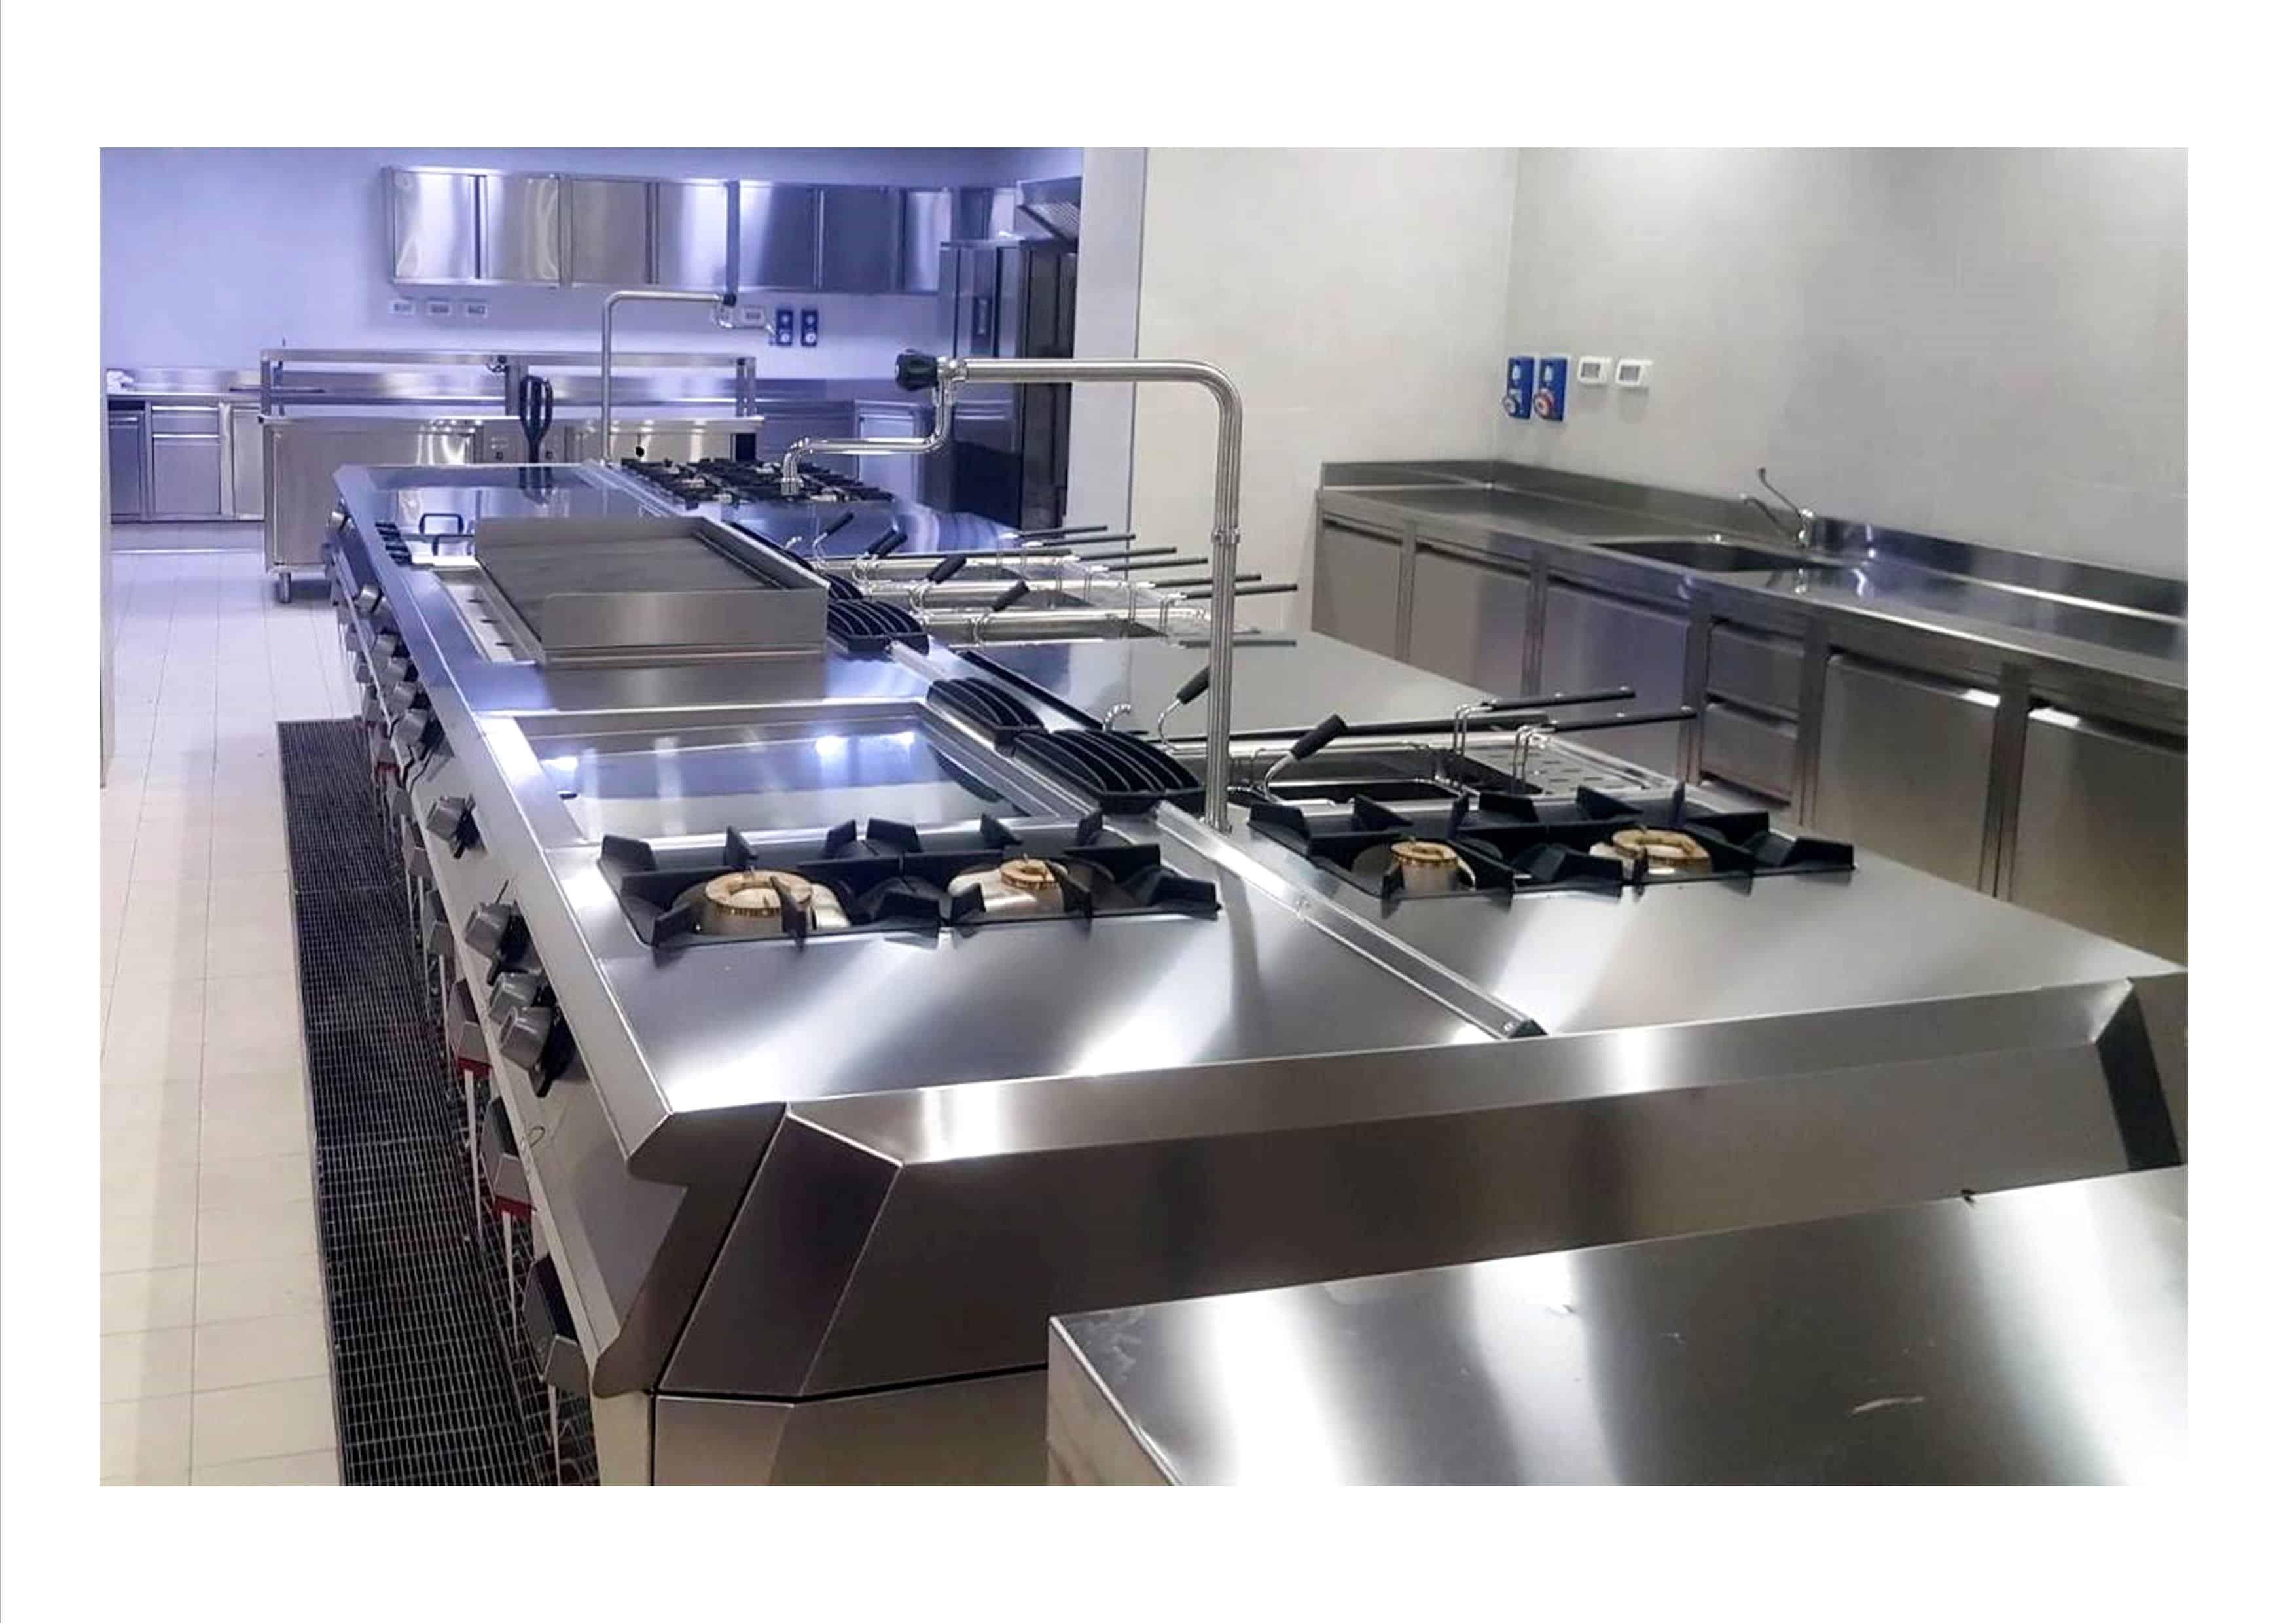 Cucina lampade viola